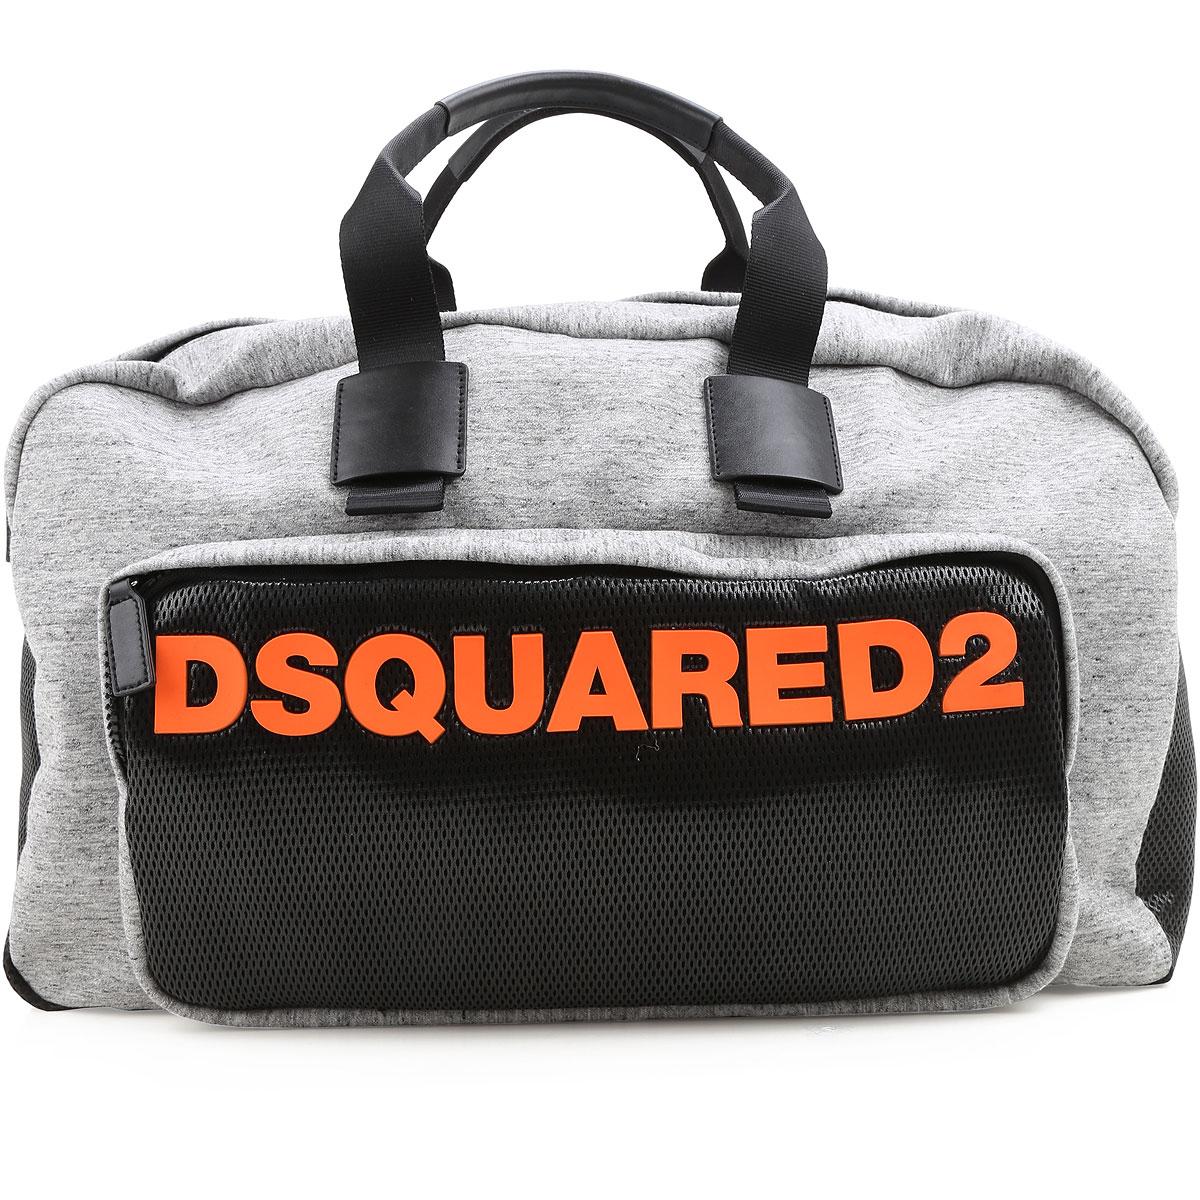 90efc8d132e8 Shop Dsquared2 Duffel Bag for Men - Obsessory